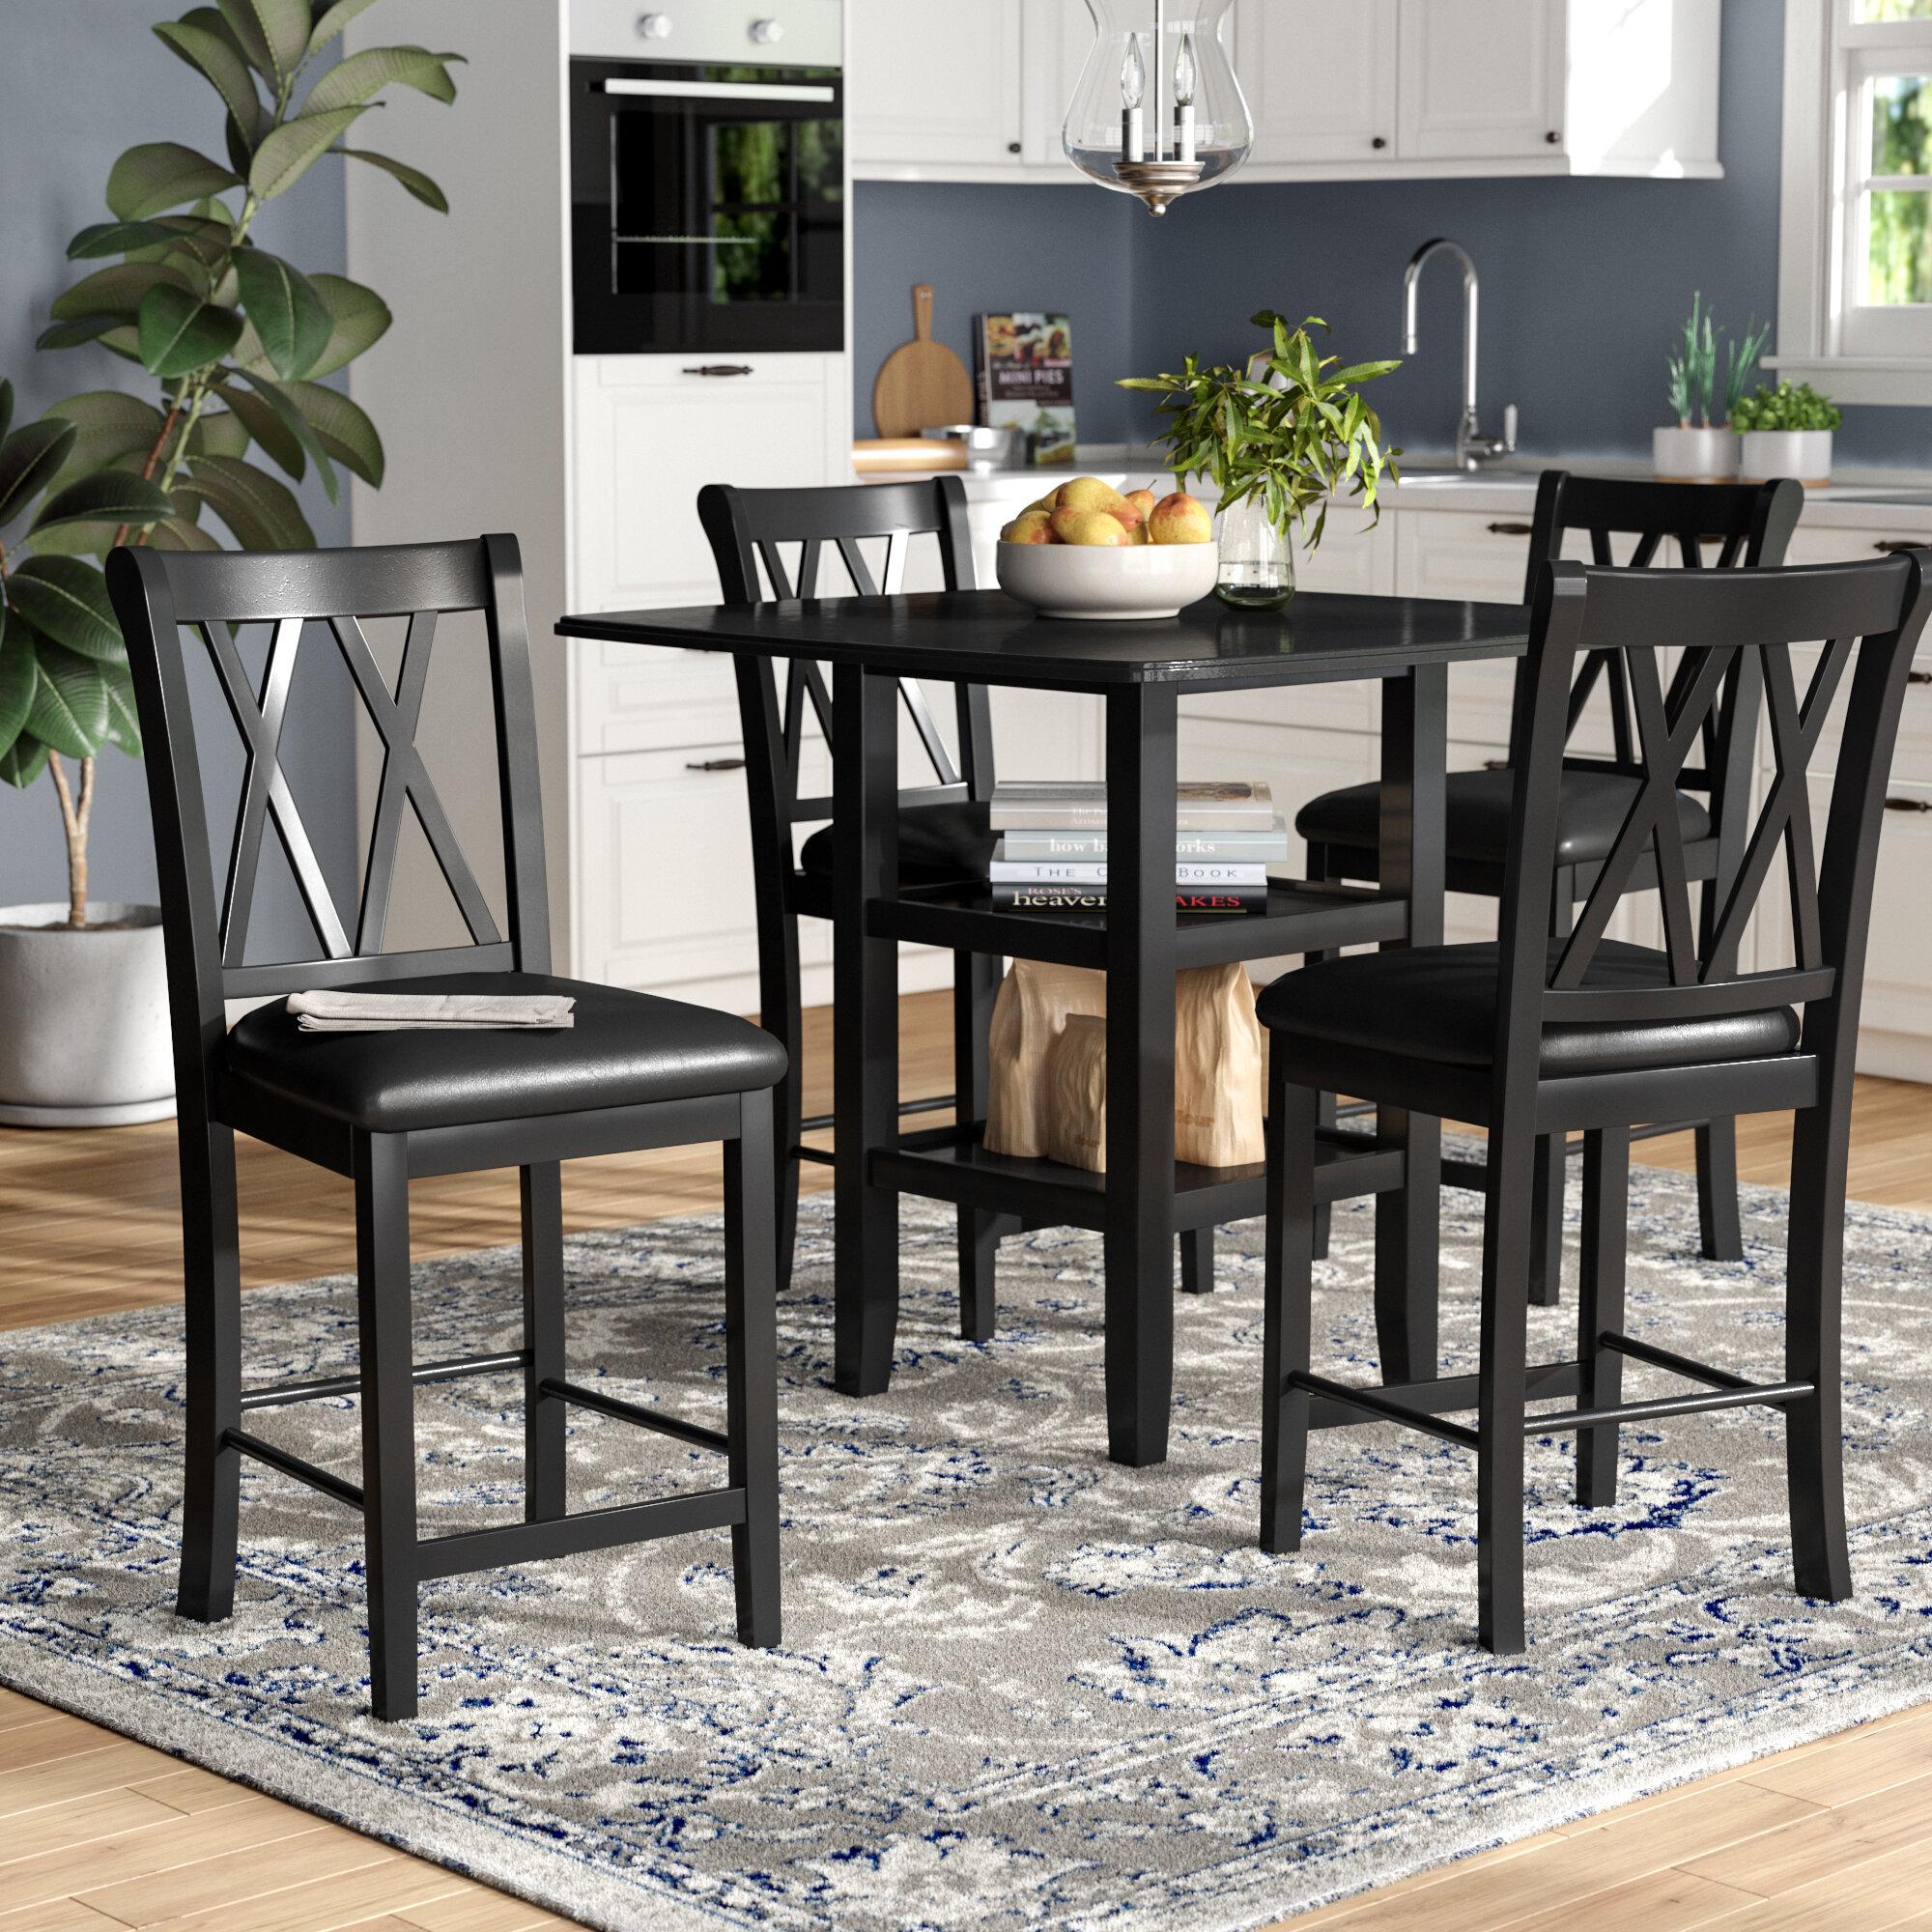 Attirant Darby Home Co Kathie 5 Piece Counter Height Dining Set U0026 Reviews | Wayfair